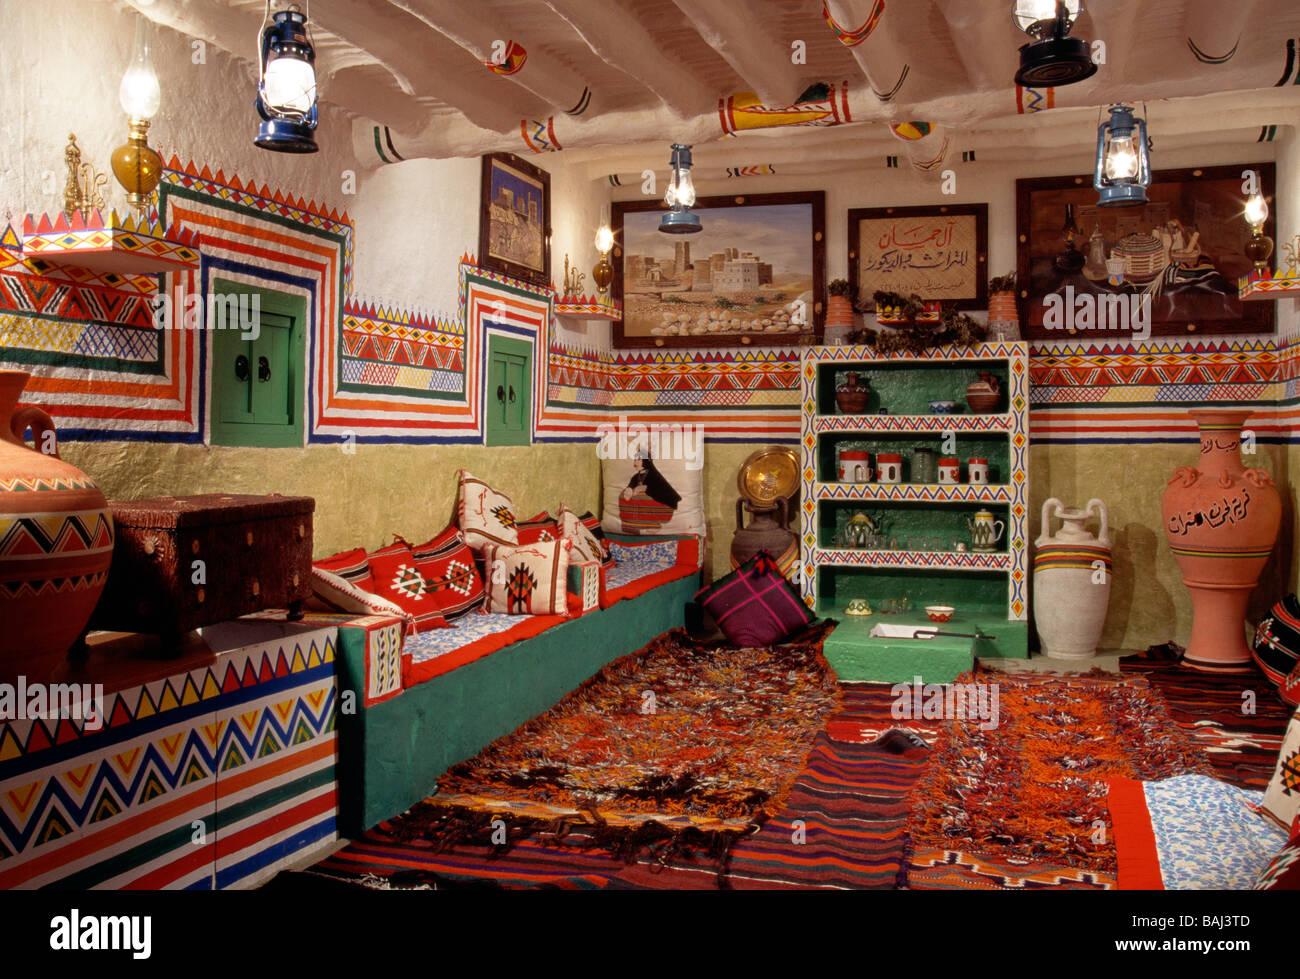 interior of a traditional saudi arabian home on display in a hotel near abha kingdom of saudi arabia - Traditional Hotel Interior